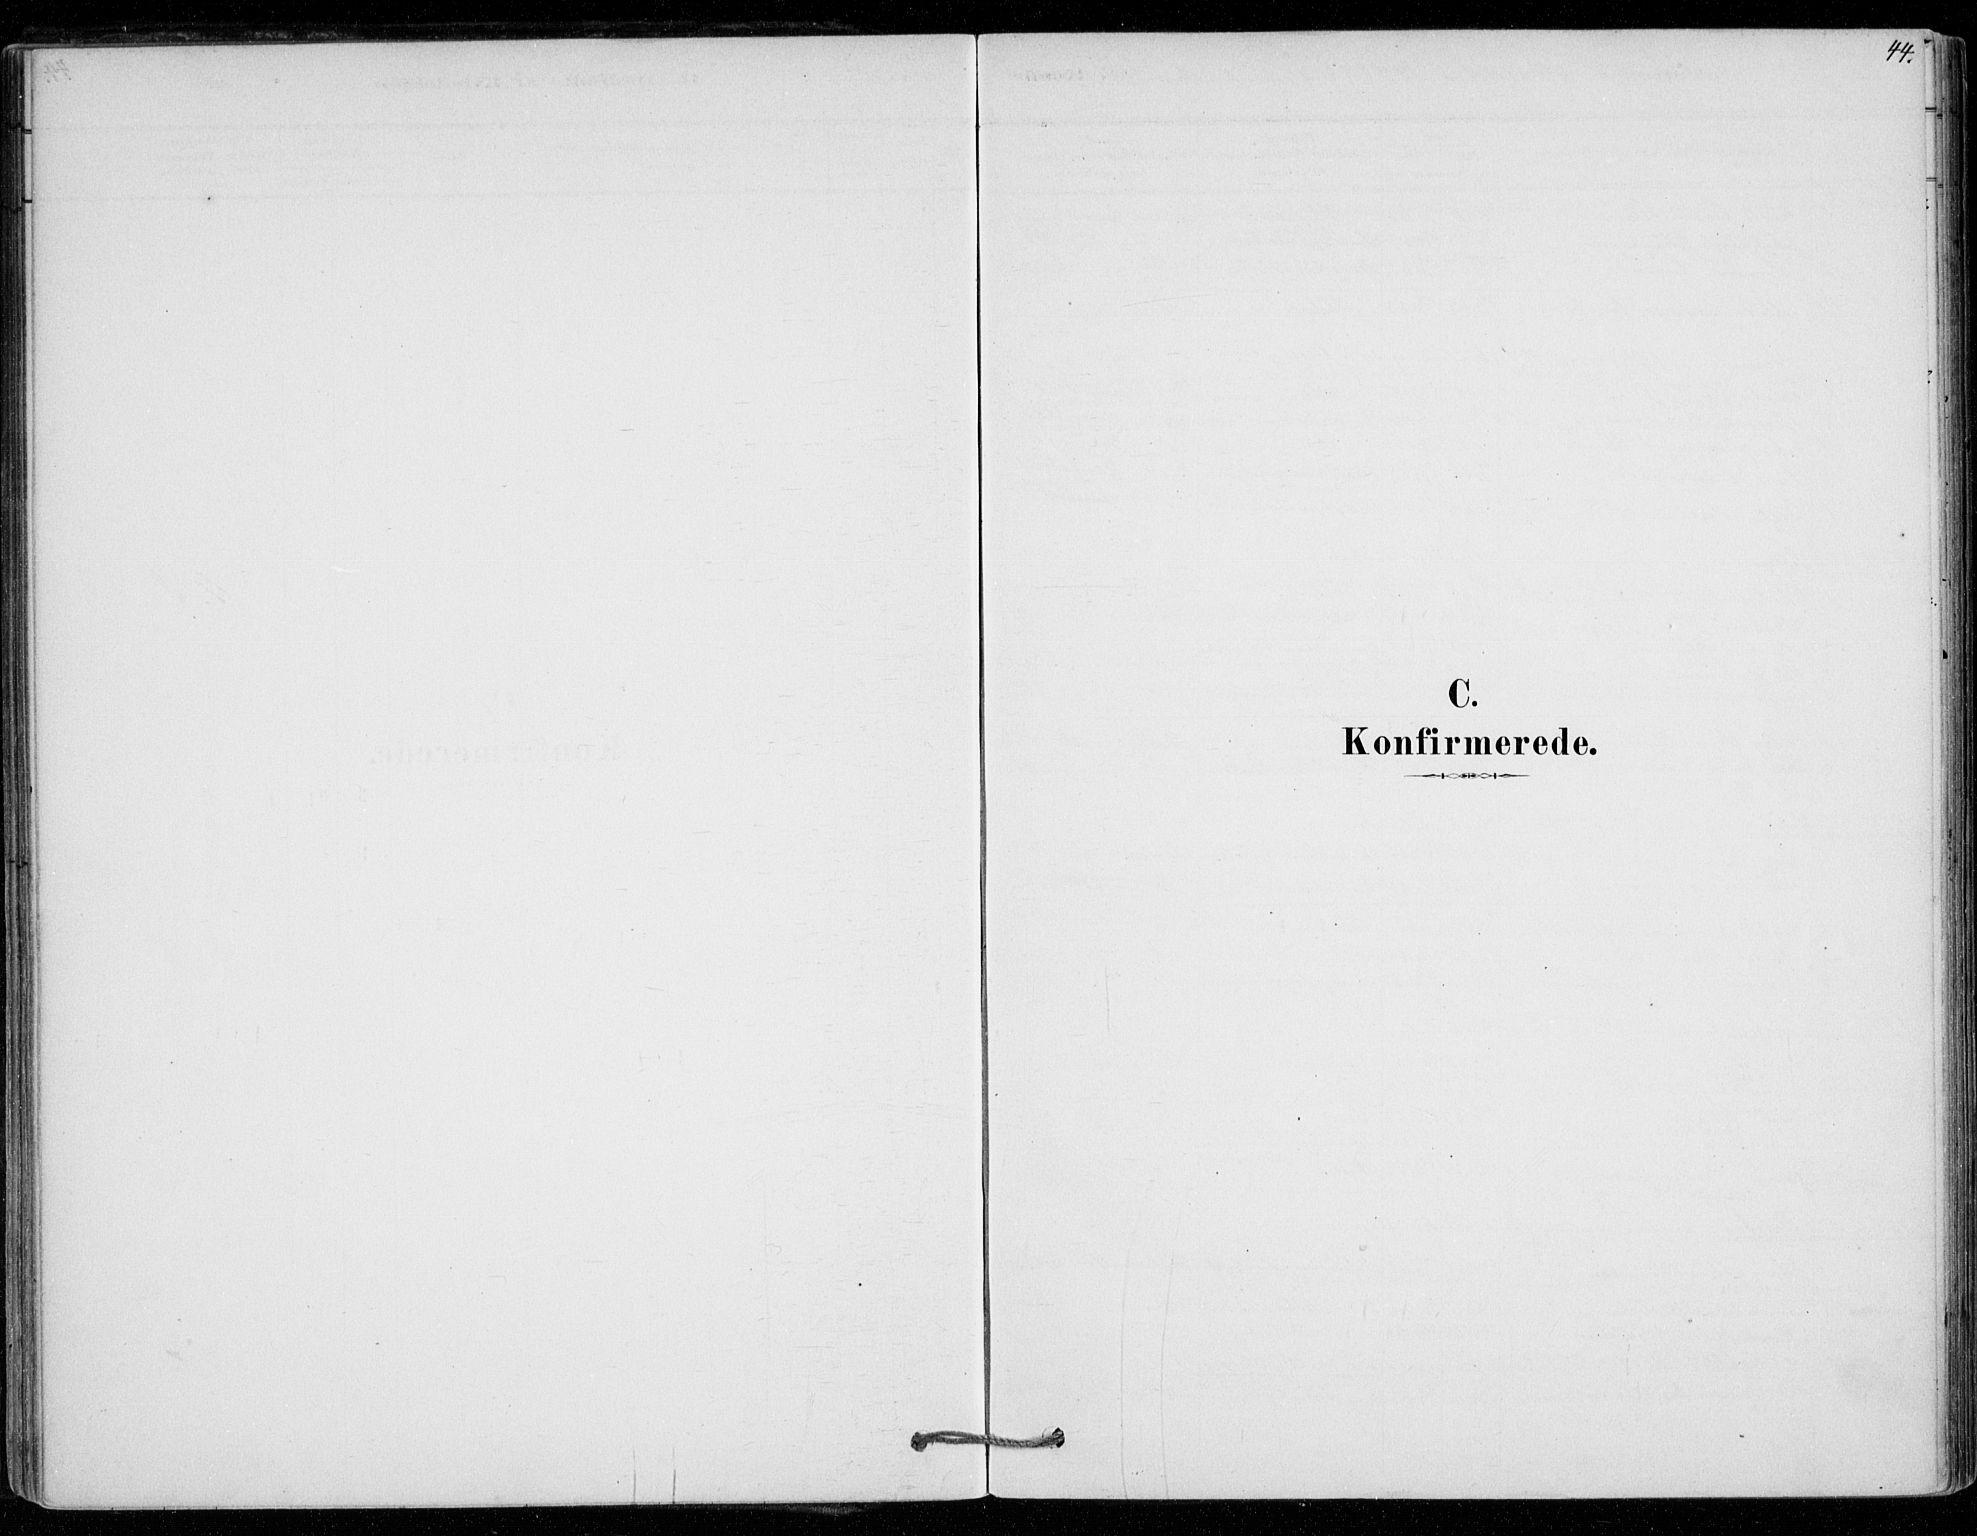 SAO, Vestby prestekontor Kirkebøker, F/Fe/L0001: Ministerialbok nr. V 1, 1878-1931, s. 44